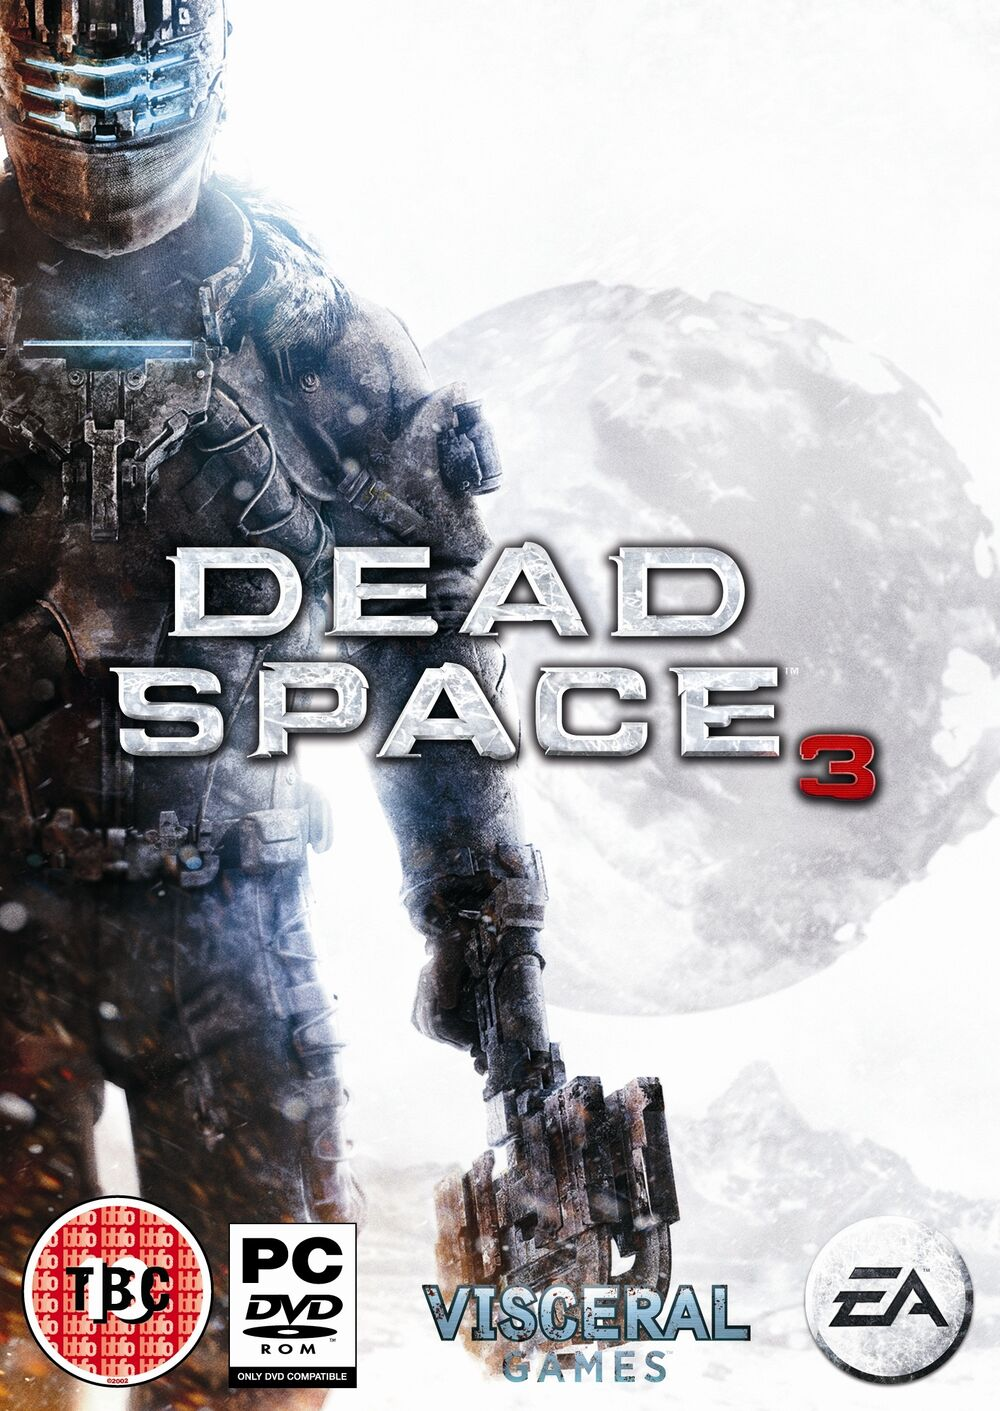 [Dossier] - Dead Space, la Série I - II - III 1000px-DS3-PC_cover